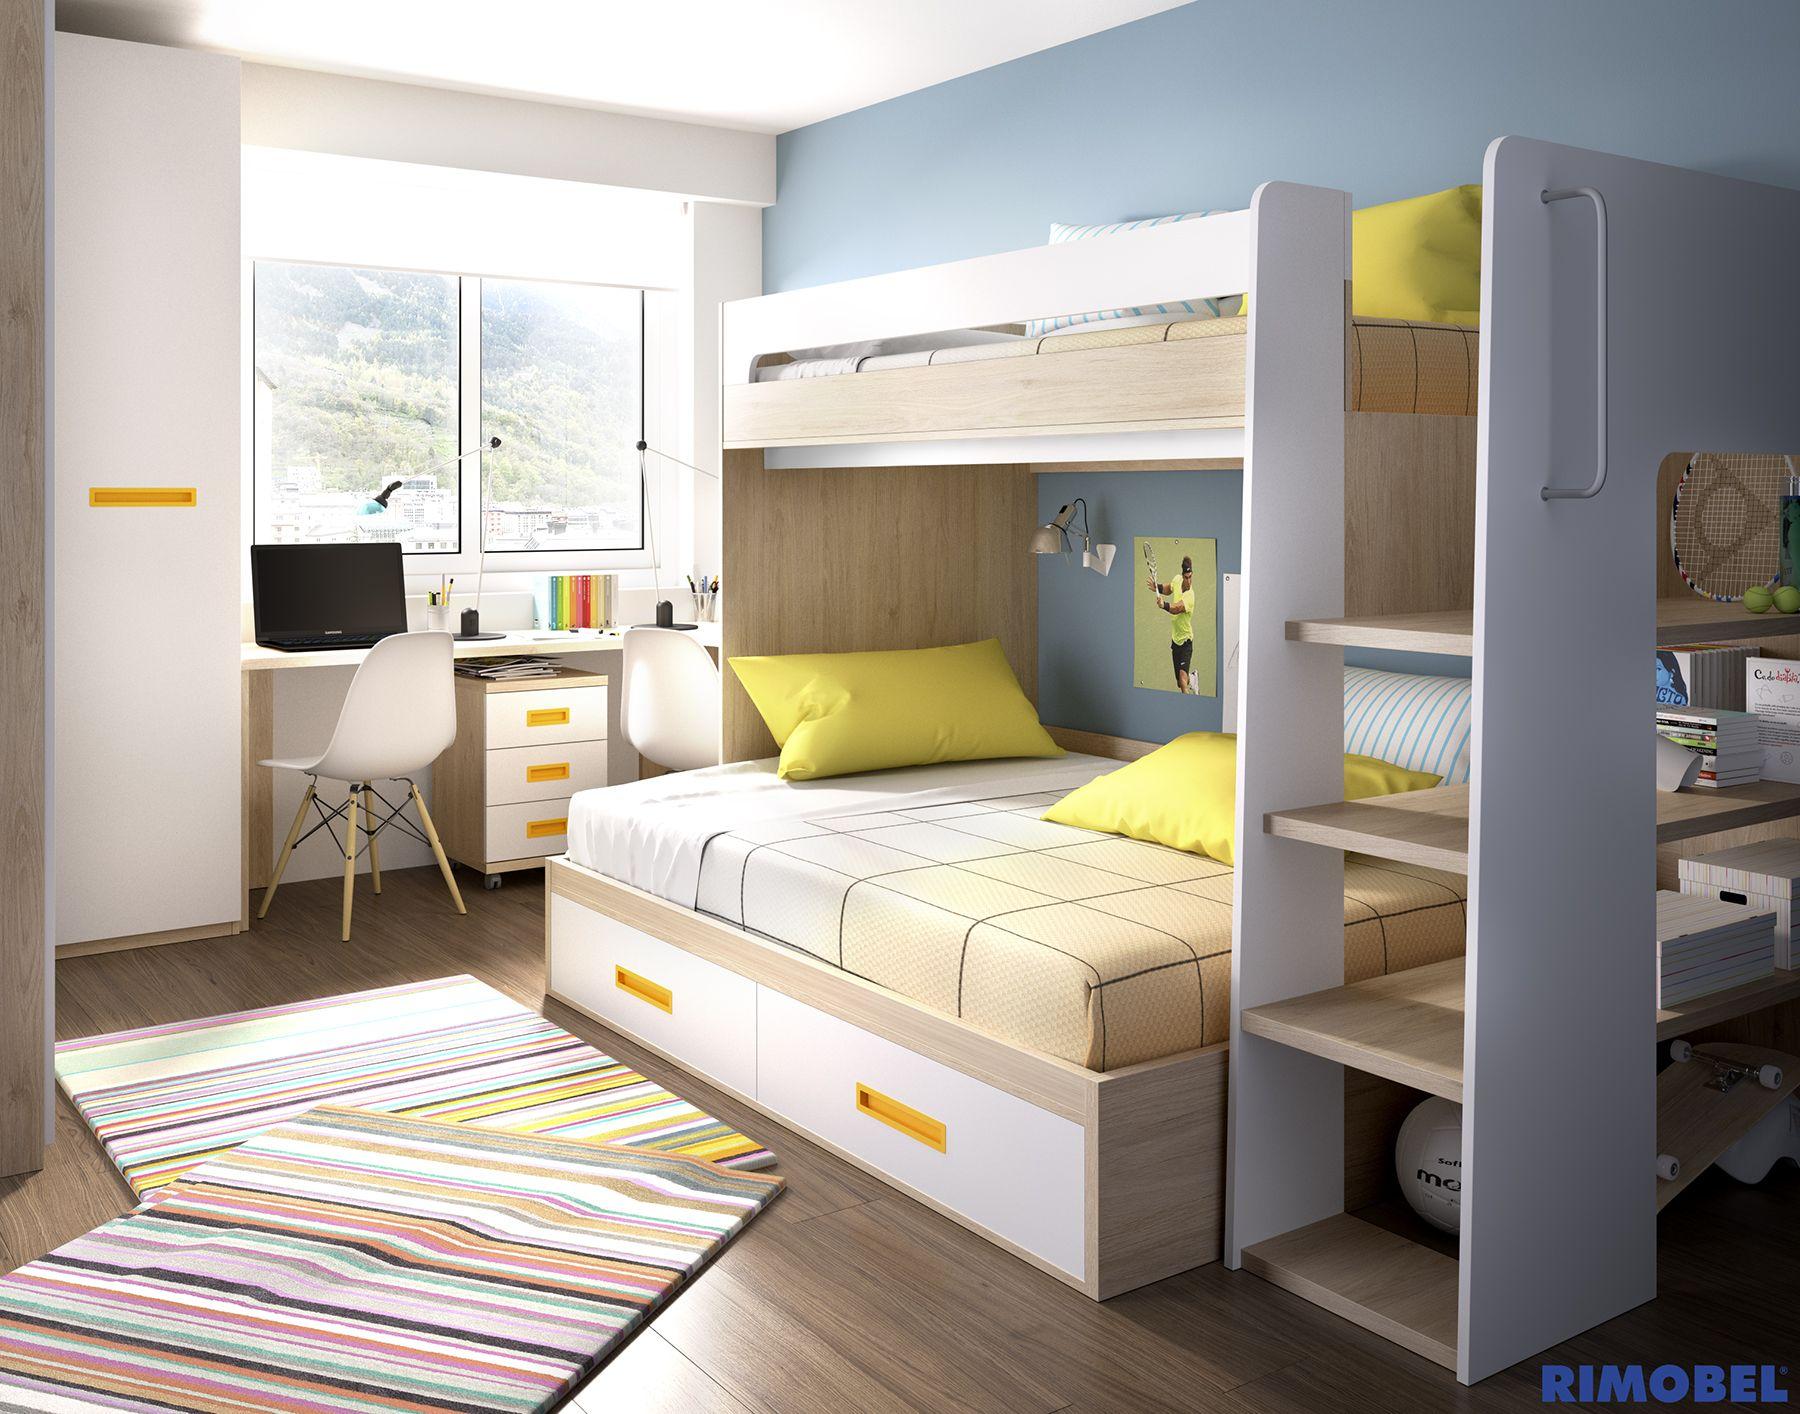 F 82 habitaci n juvenil para aprovechar al m ximo el for Habitacion con litera